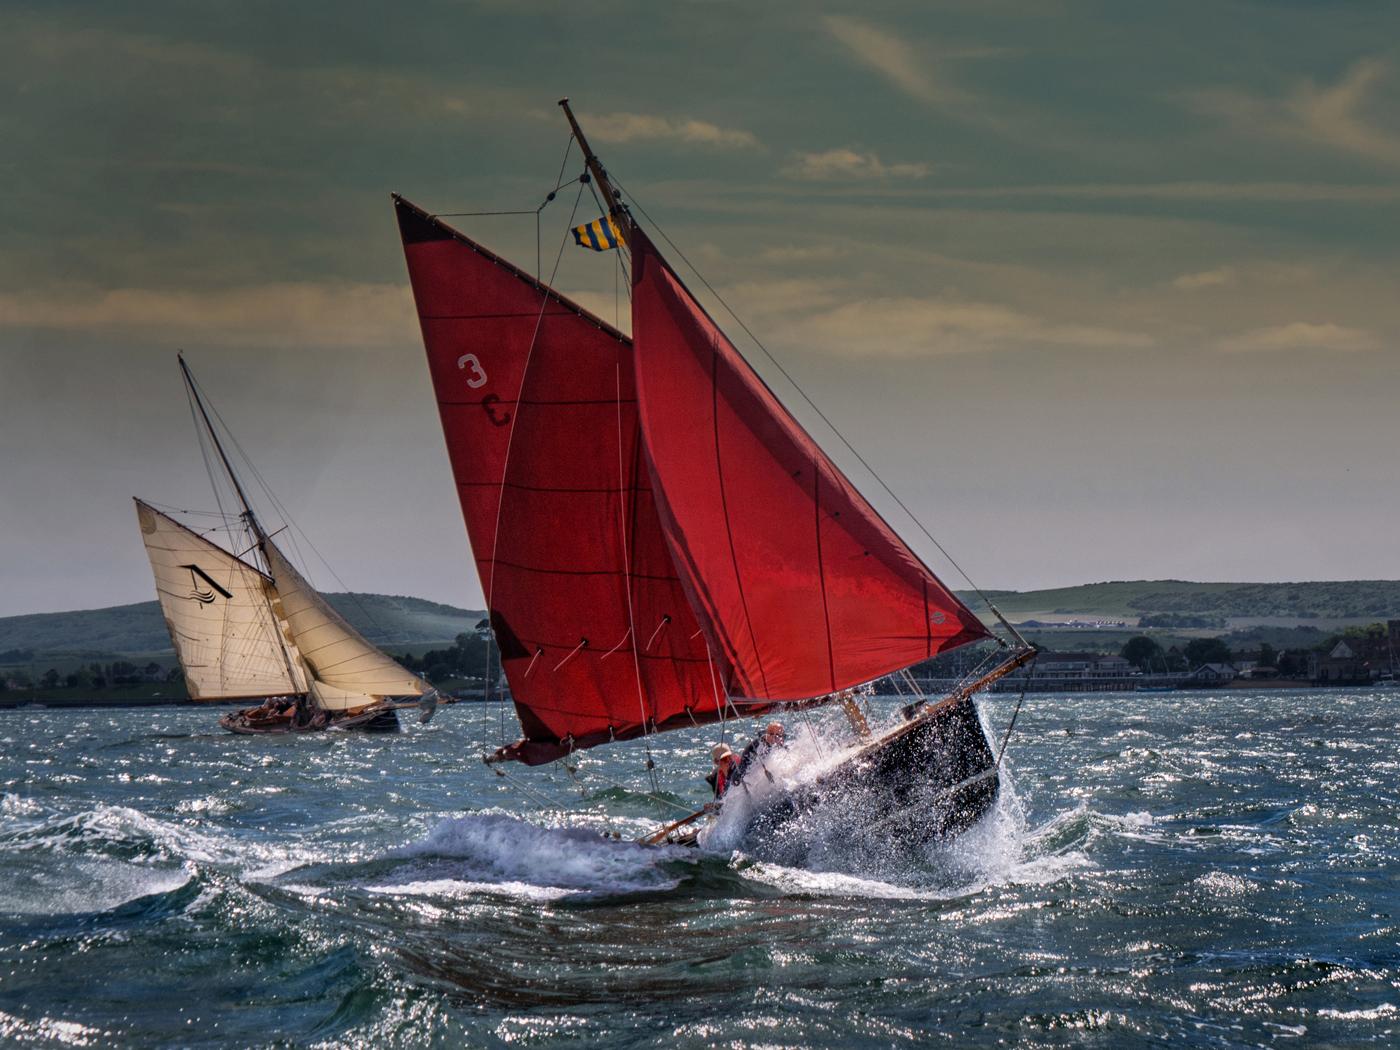 'Sea Spray' by Ian Porter